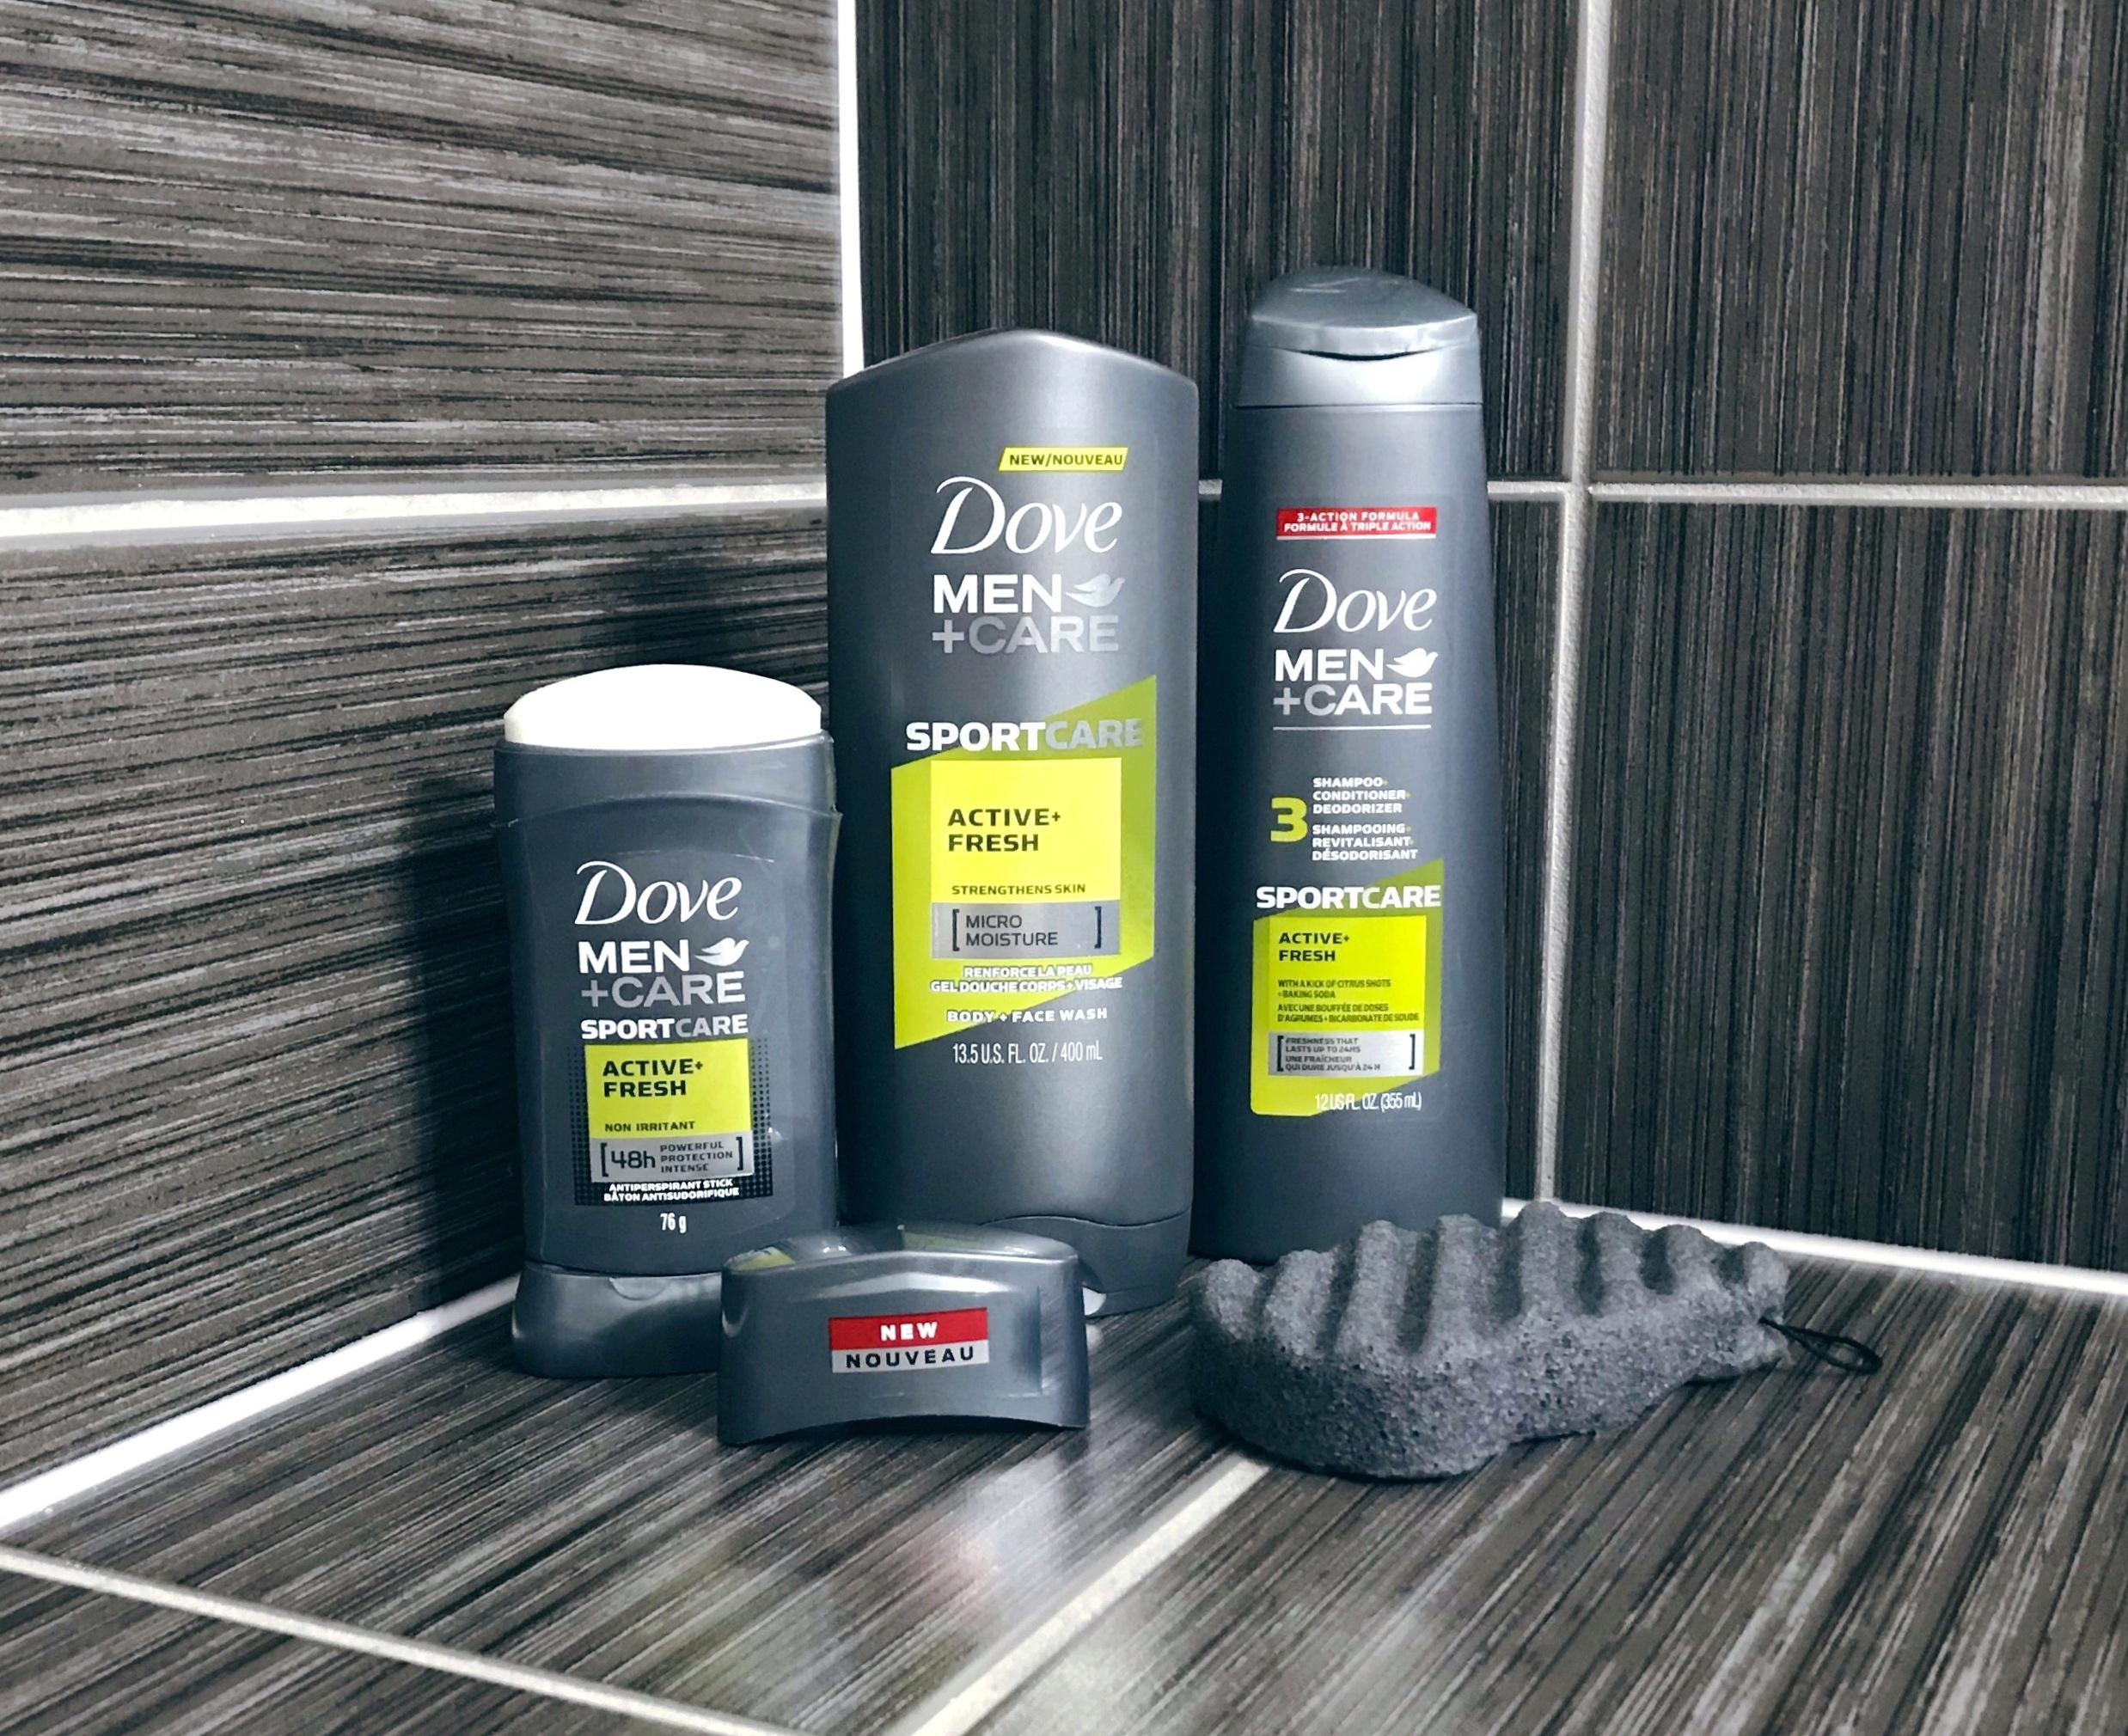 Dove Men Care Sportcare Active Fresh Body Face Wash Reviews In Men S Body Wash Chickadvisor